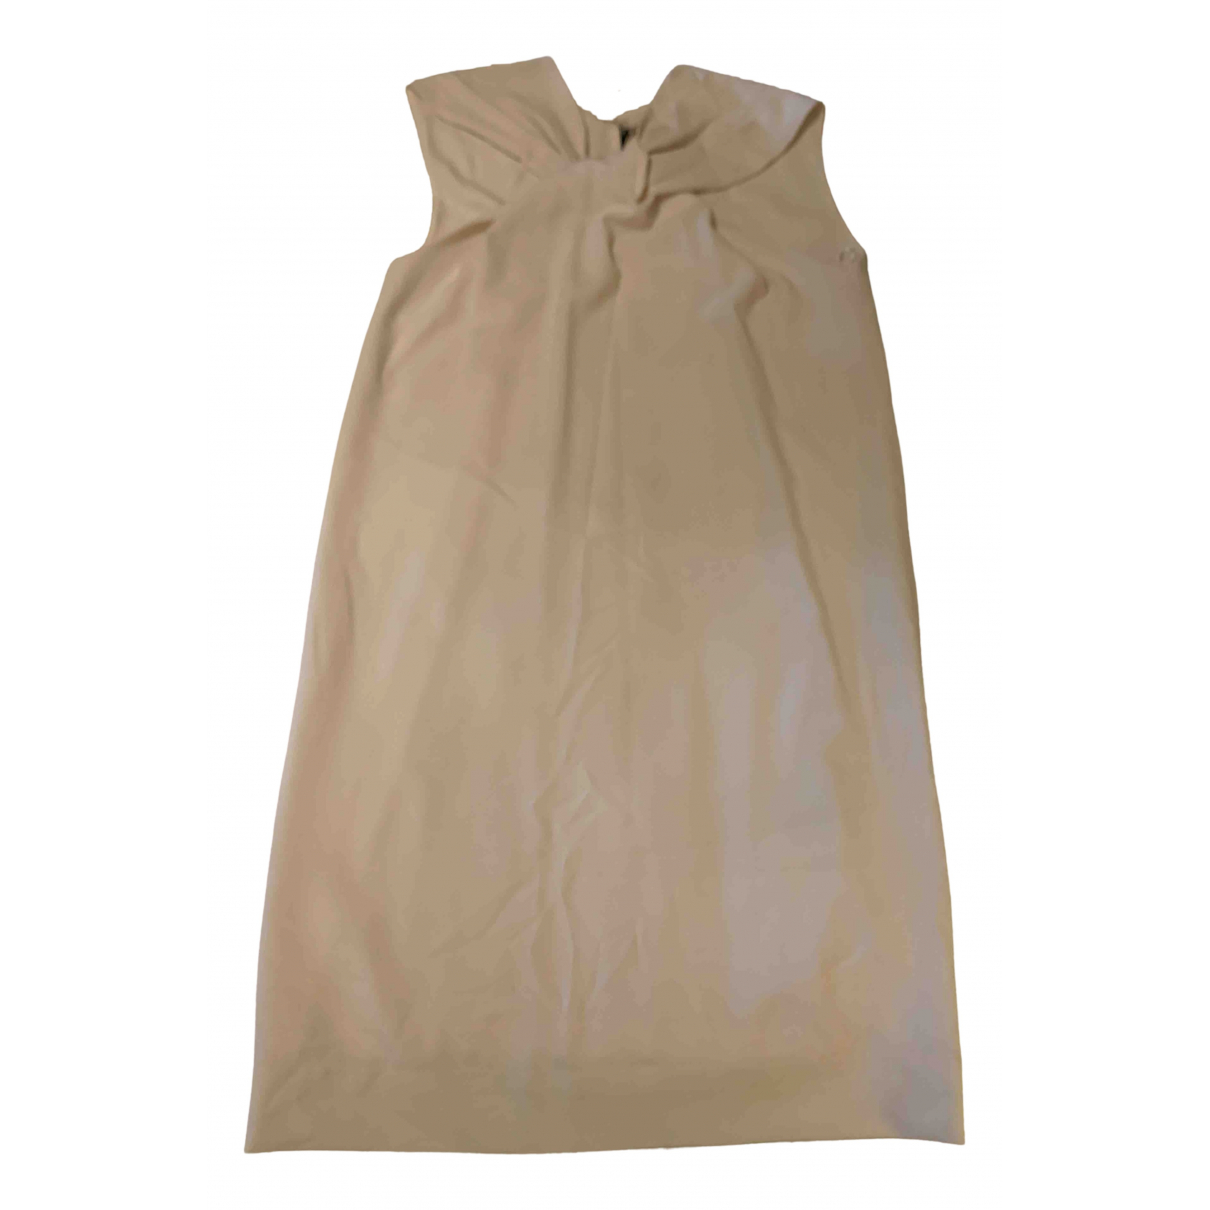 Gat Rimon \N Kleid in  Ecru Polyester